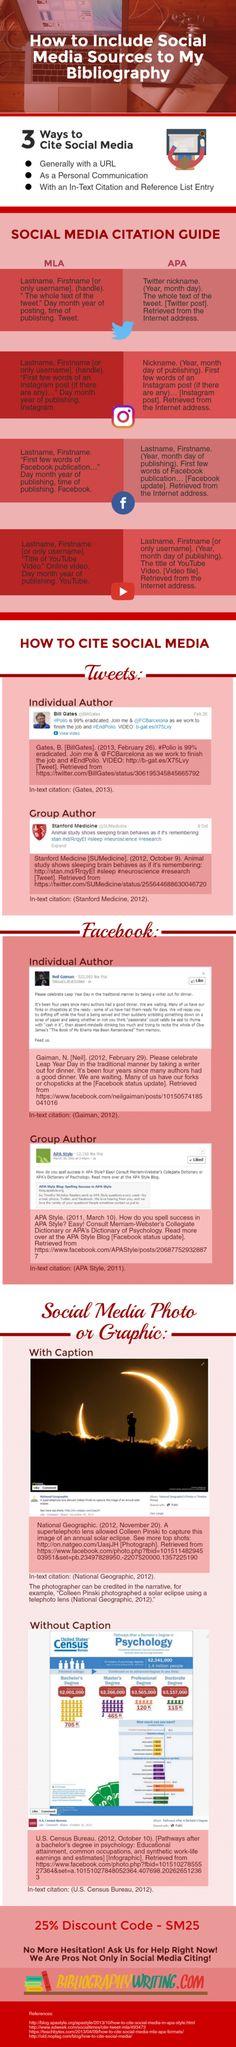 11 best APA help images on Pinterest | Apa format example, Nursing ...